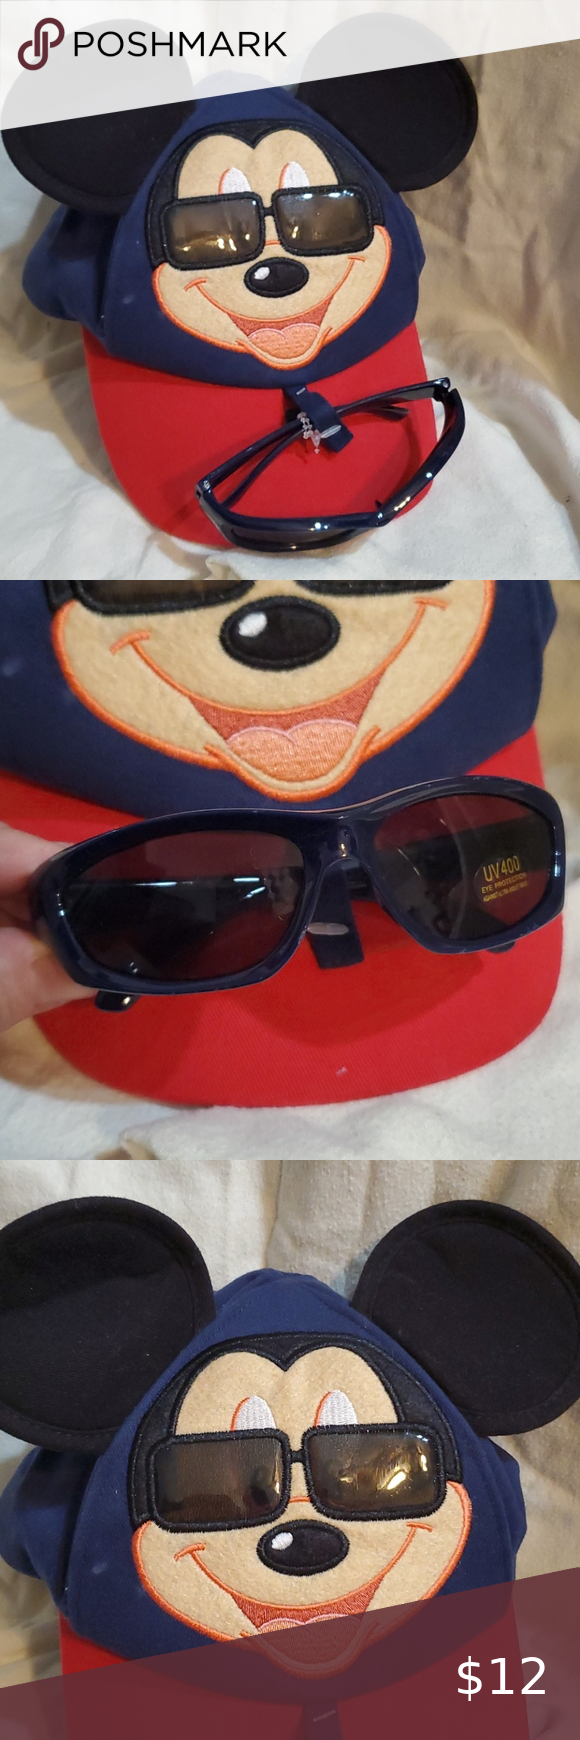 5 15 Disney Toddler Hat Sunglass Holder 215 Disney Toddler Toddler Hat Sunglass Holder